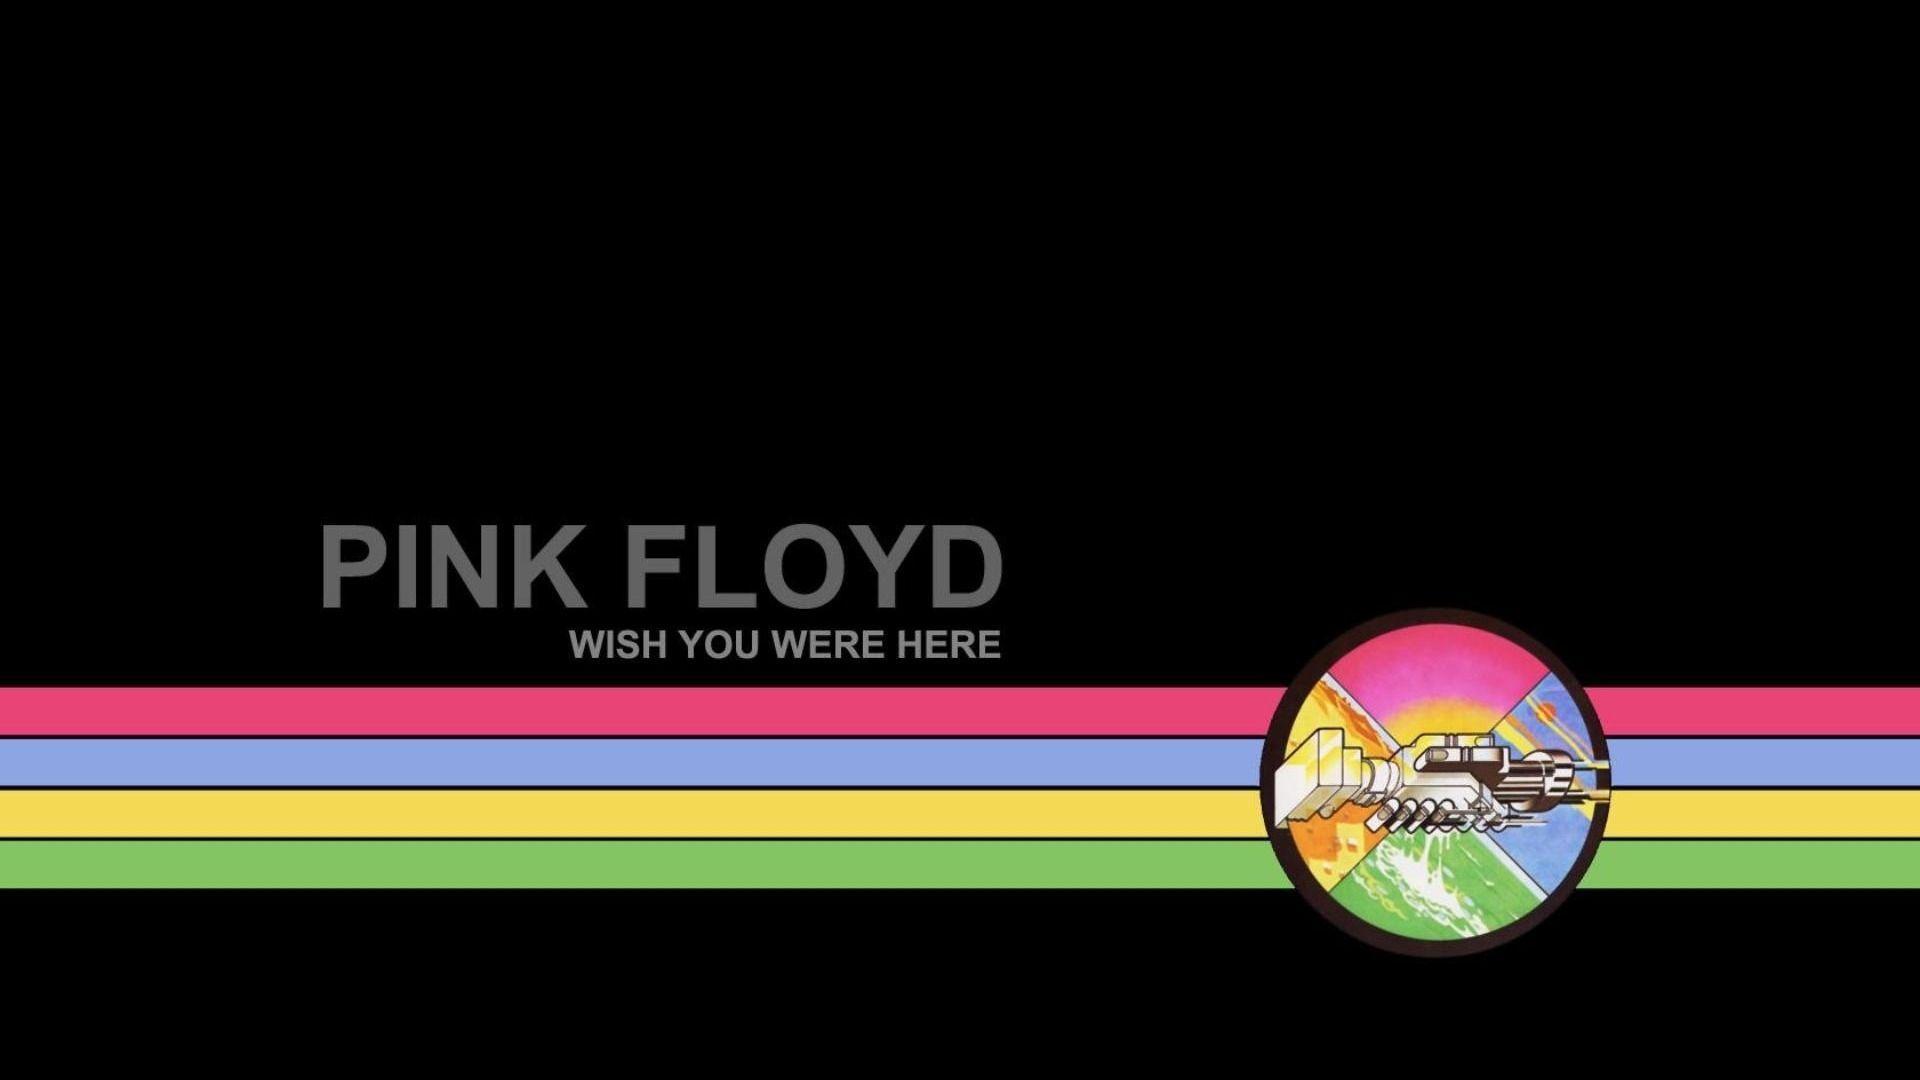 Pink Floyd Animals Wallpaper Pink Floyd Animals Wallpapers Wallpaper Cave